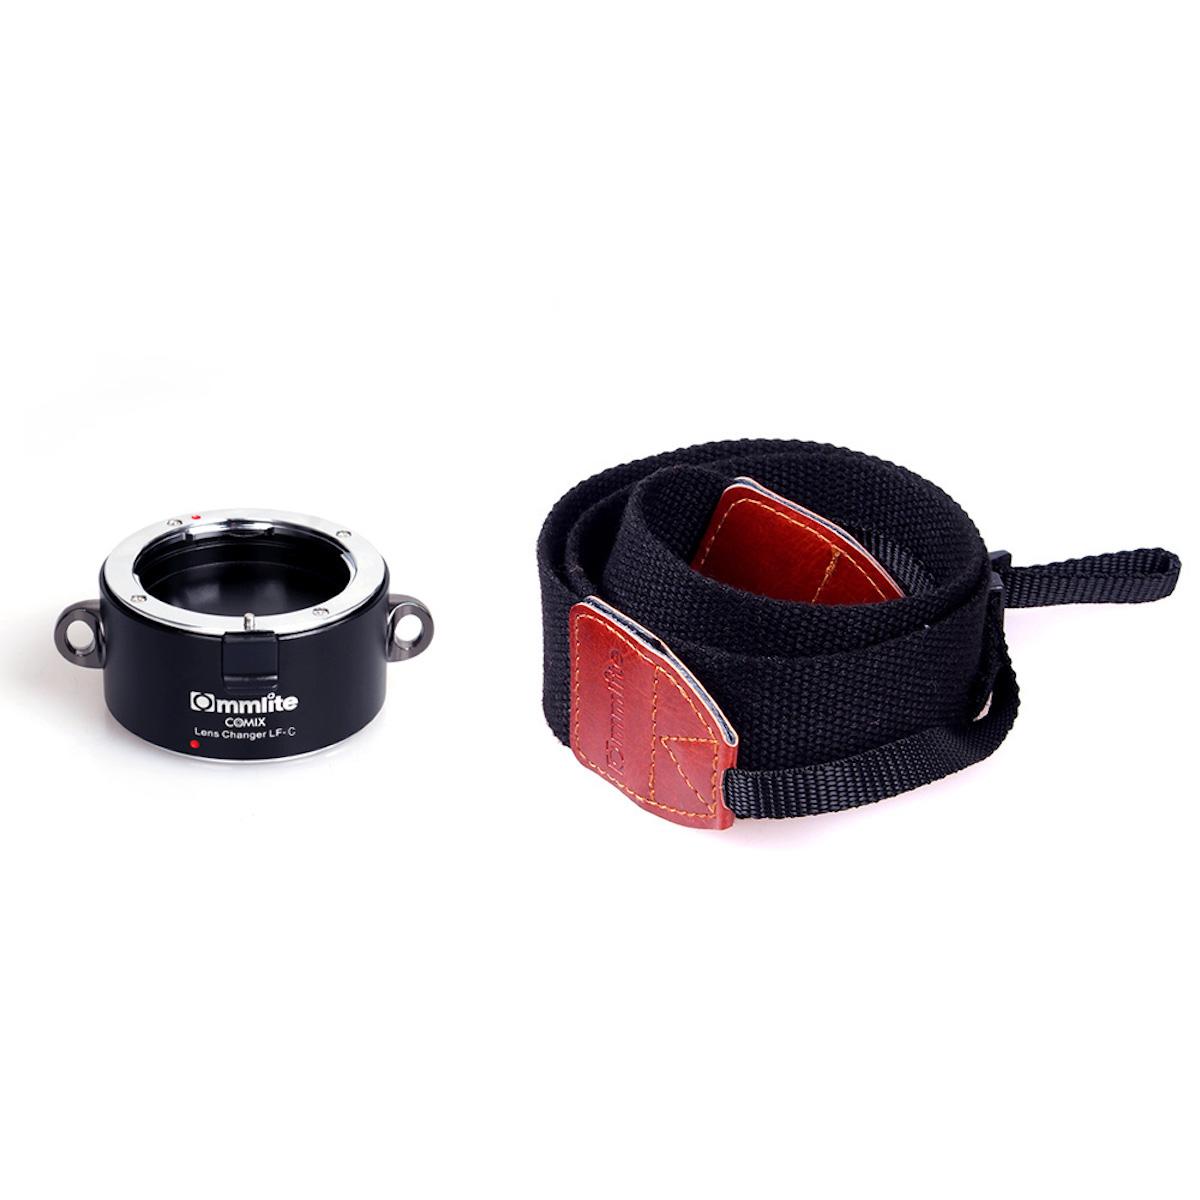 Commlite レンズホルダー CM-LF-C 正規激安 キヤノンEFマウント用 激安通販専門店